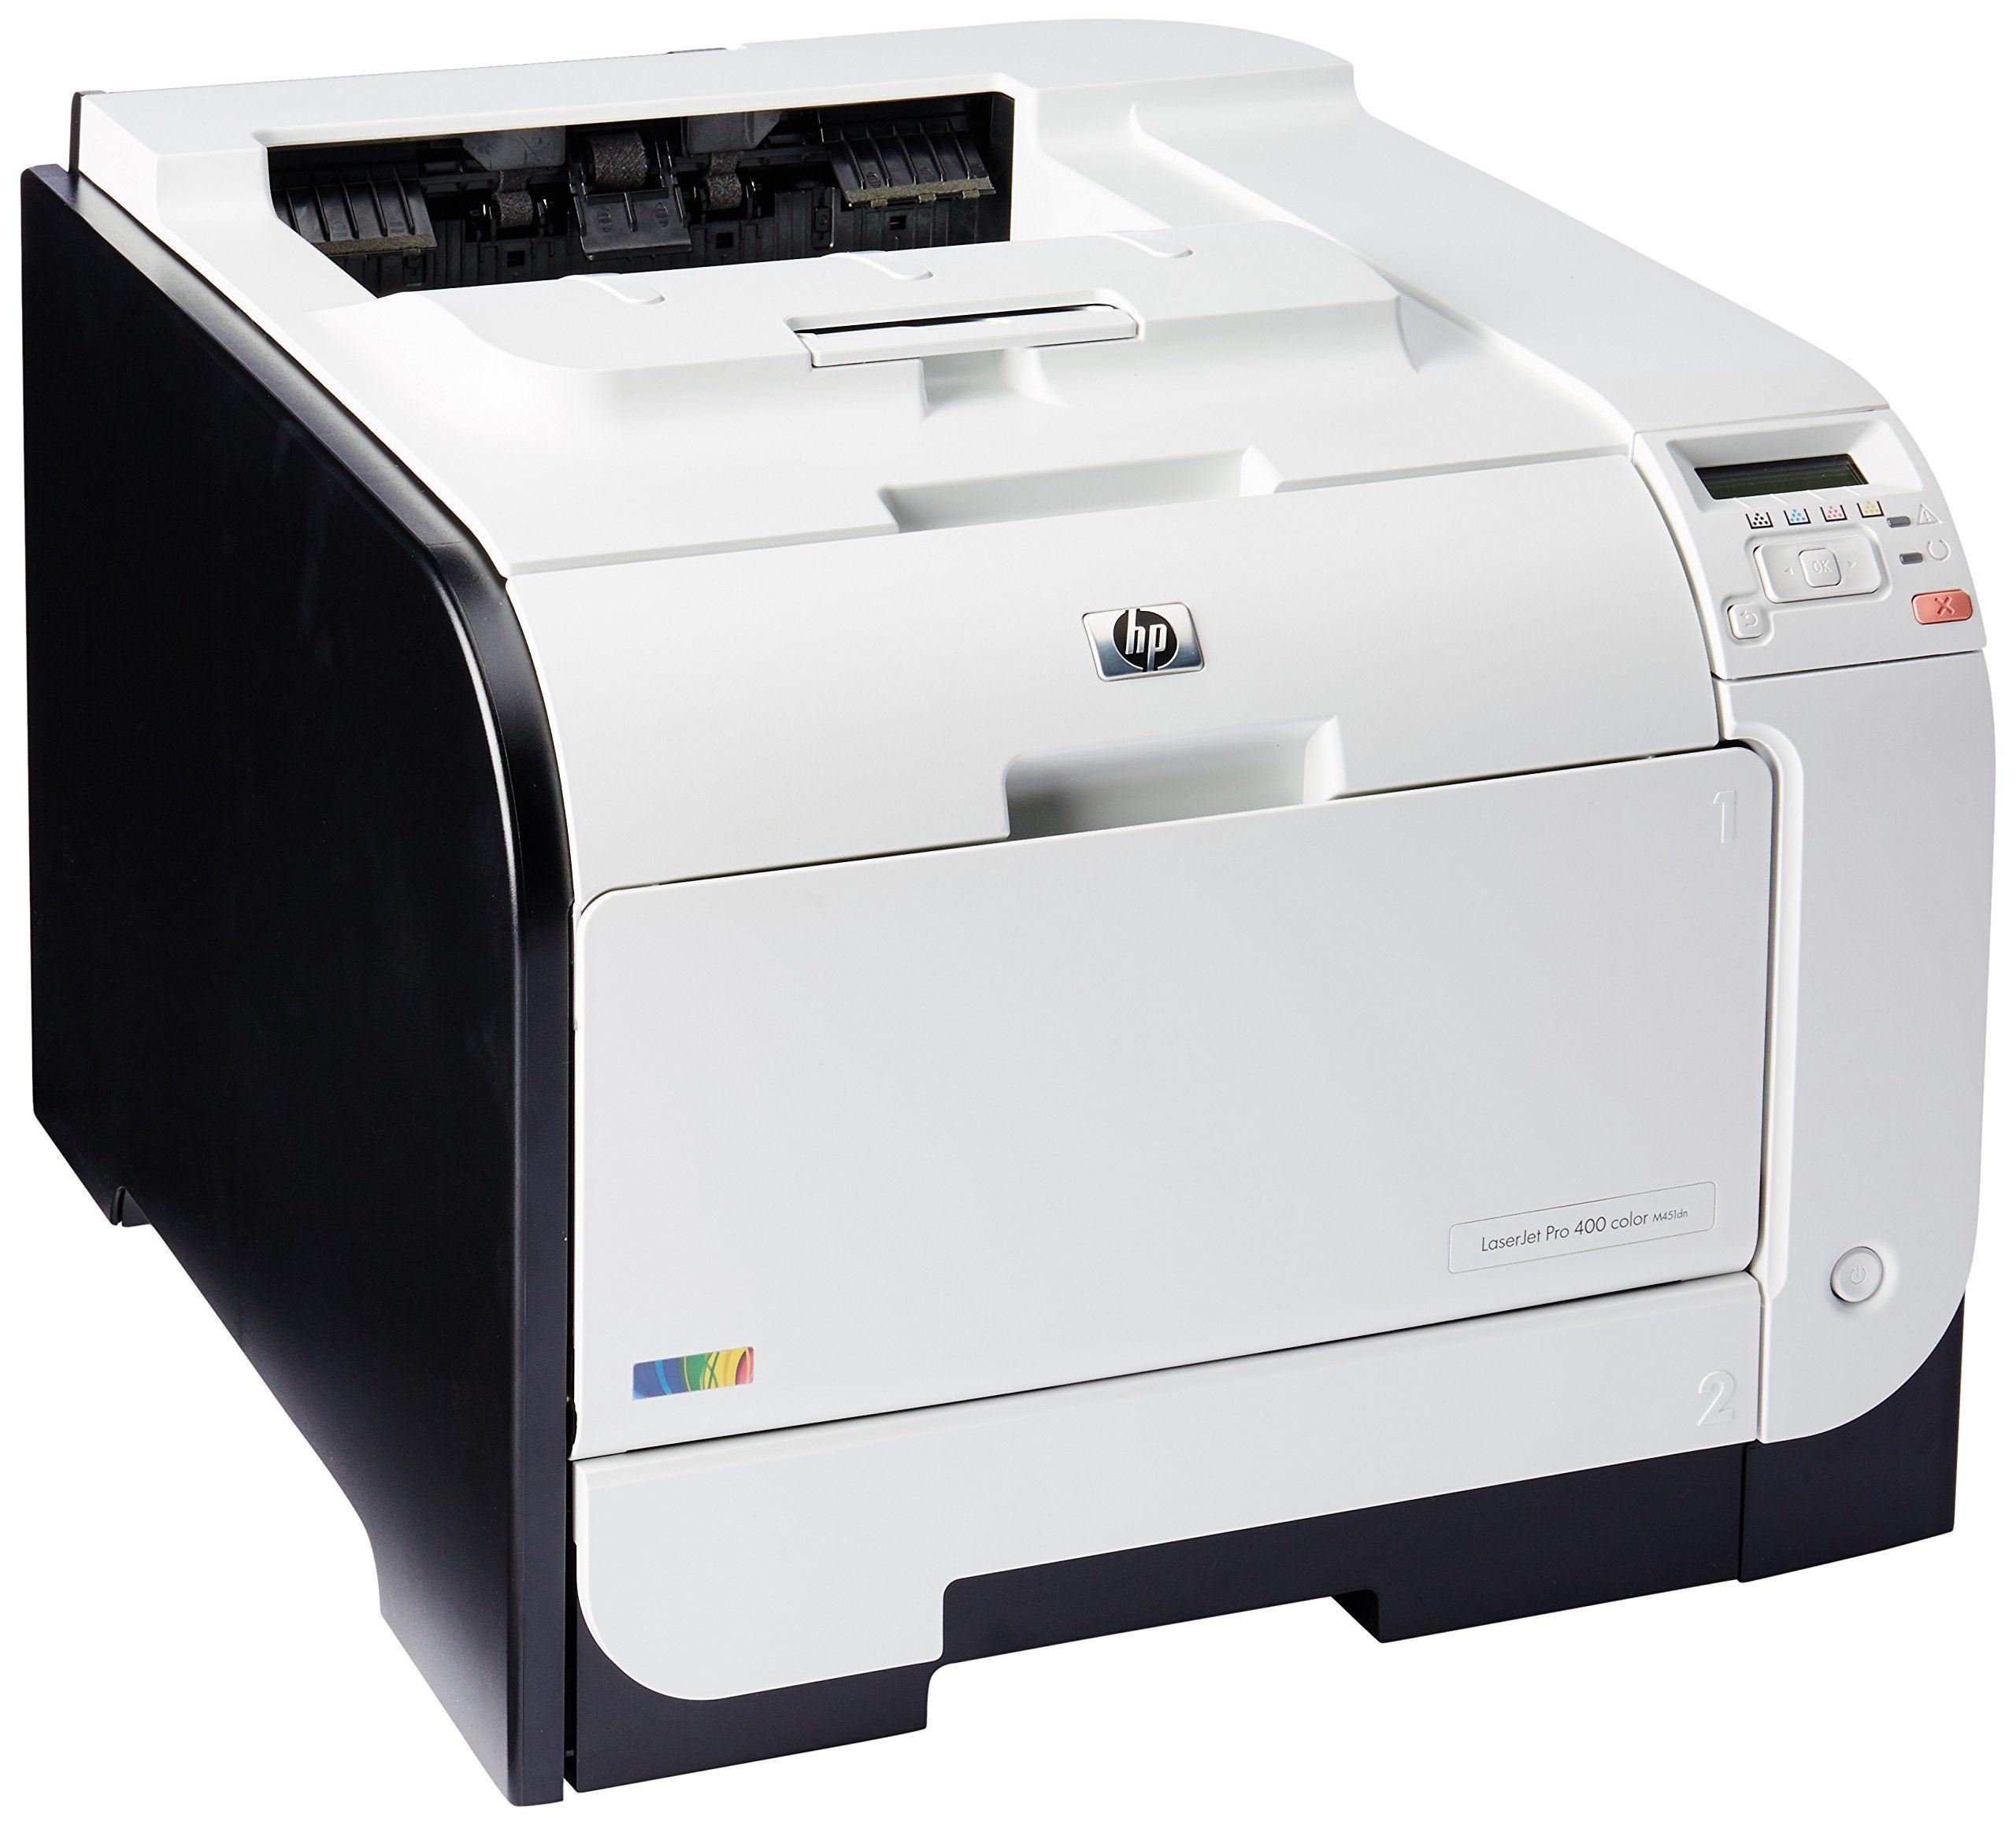 Robot Check In 2020 Color Printer Printer Kodak Printer